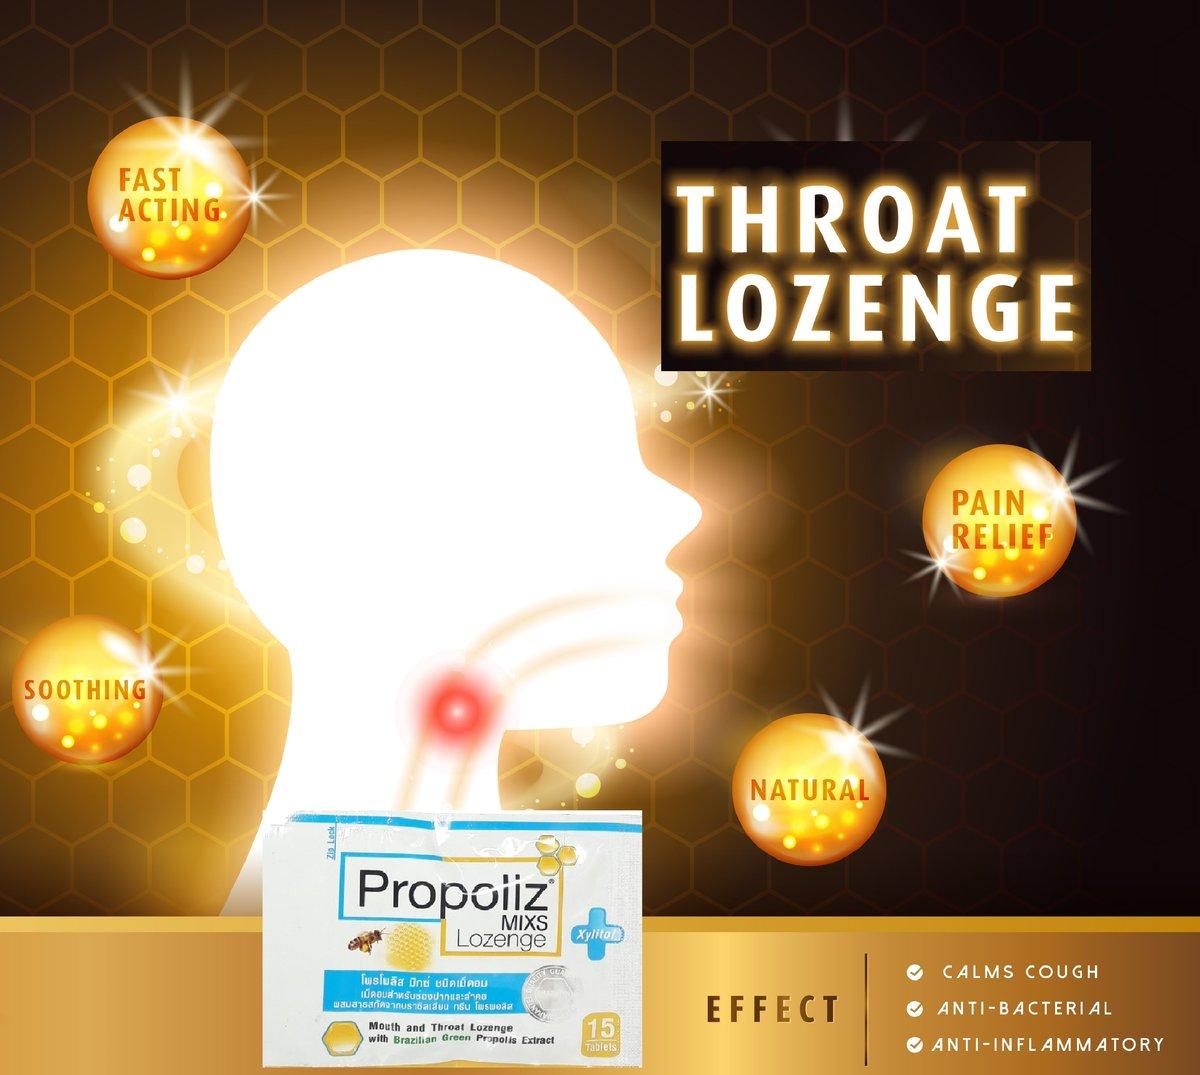 Propoliz Lozenge 15pcs (Parallel Import) Contains Propolis anti-bacterial and comfort sore throat